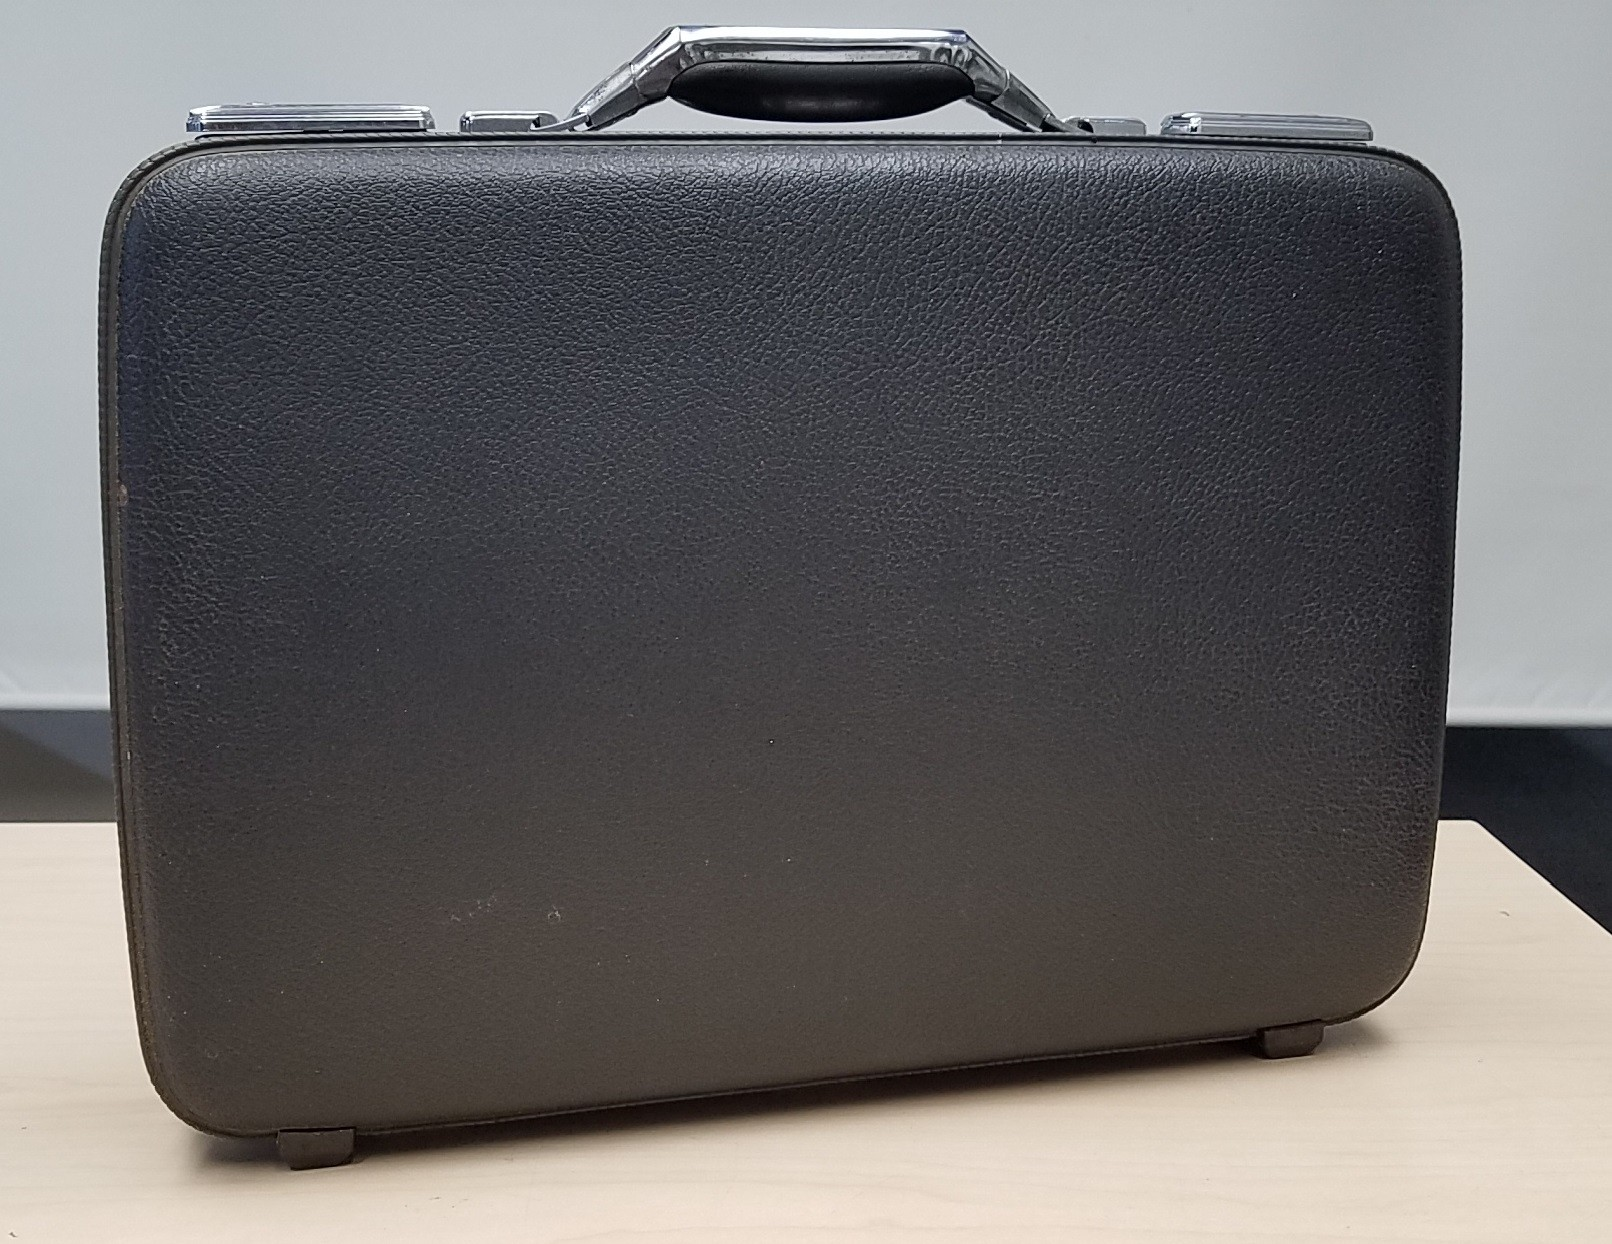 American Tourister Tiara Hard Case Key Lock Slim Briefcase Attache No Key